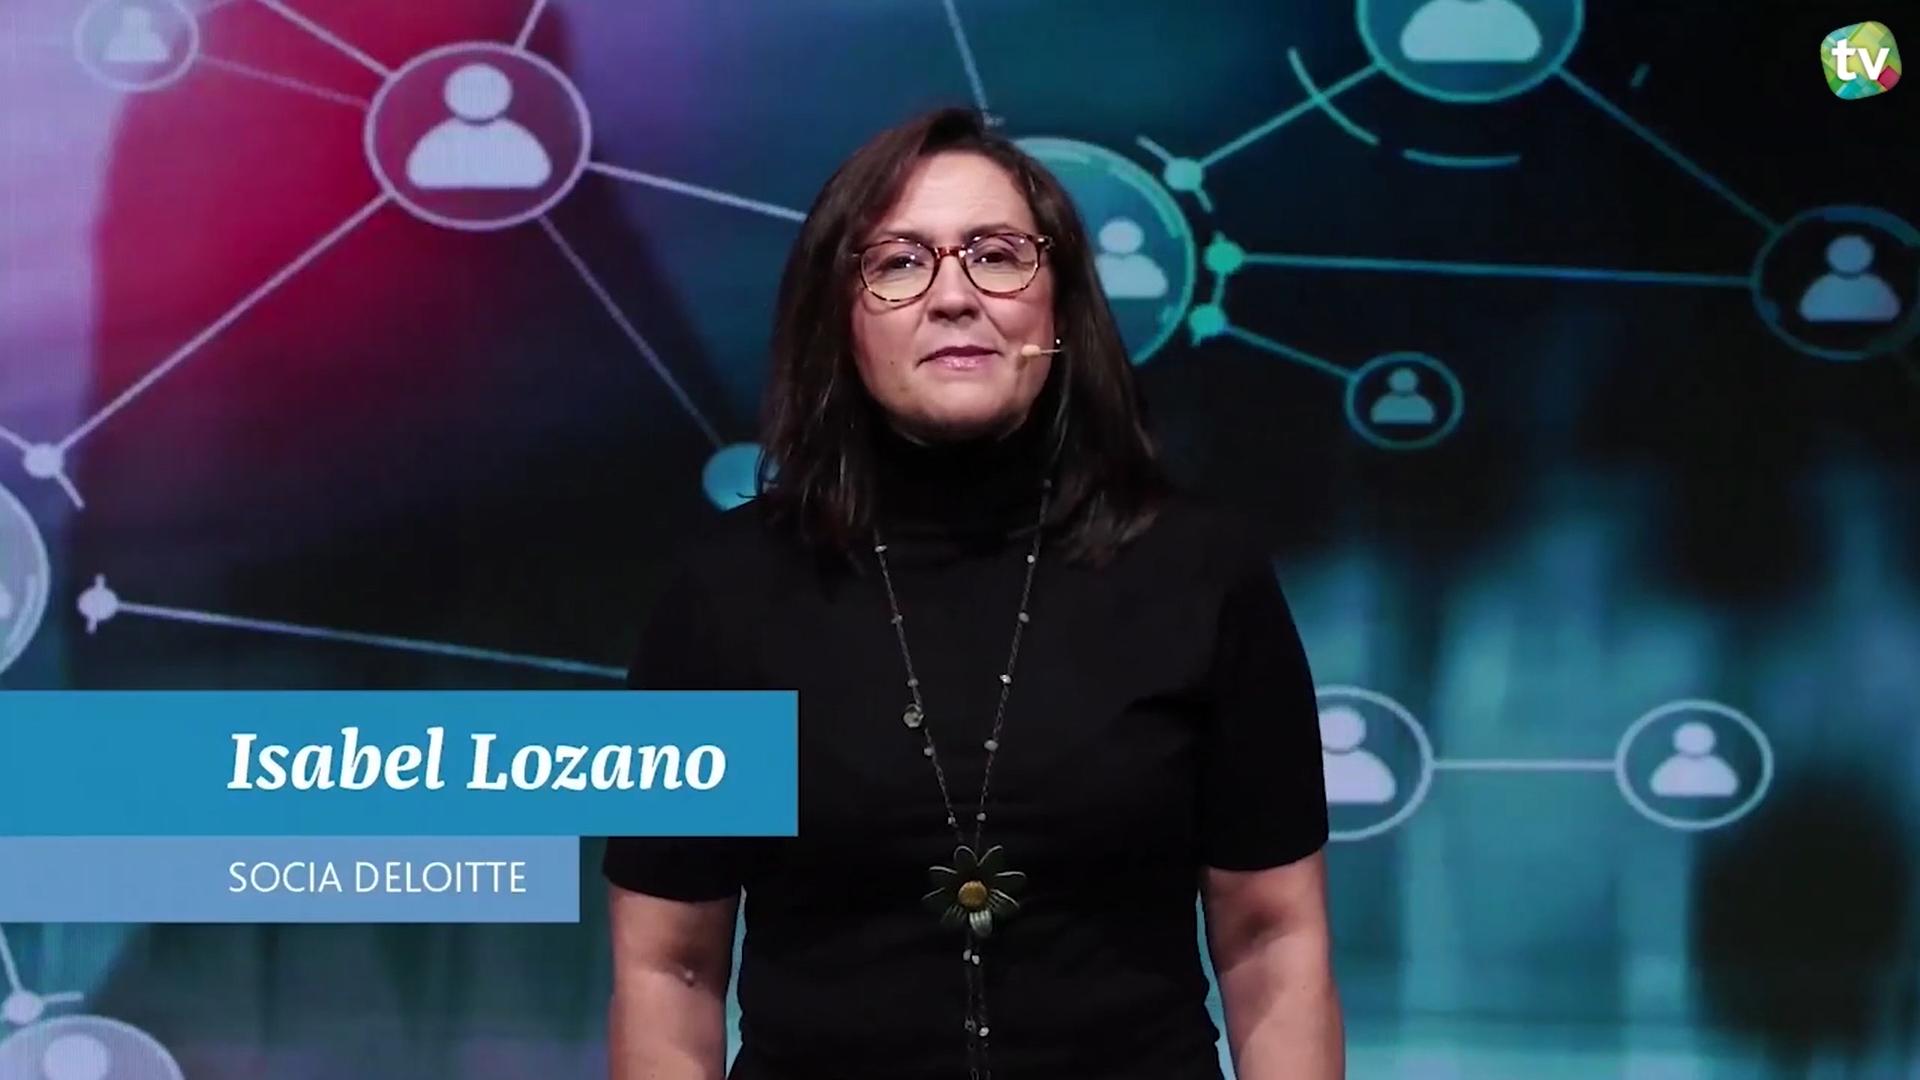 Isabel Lozano, Socia Deloitte